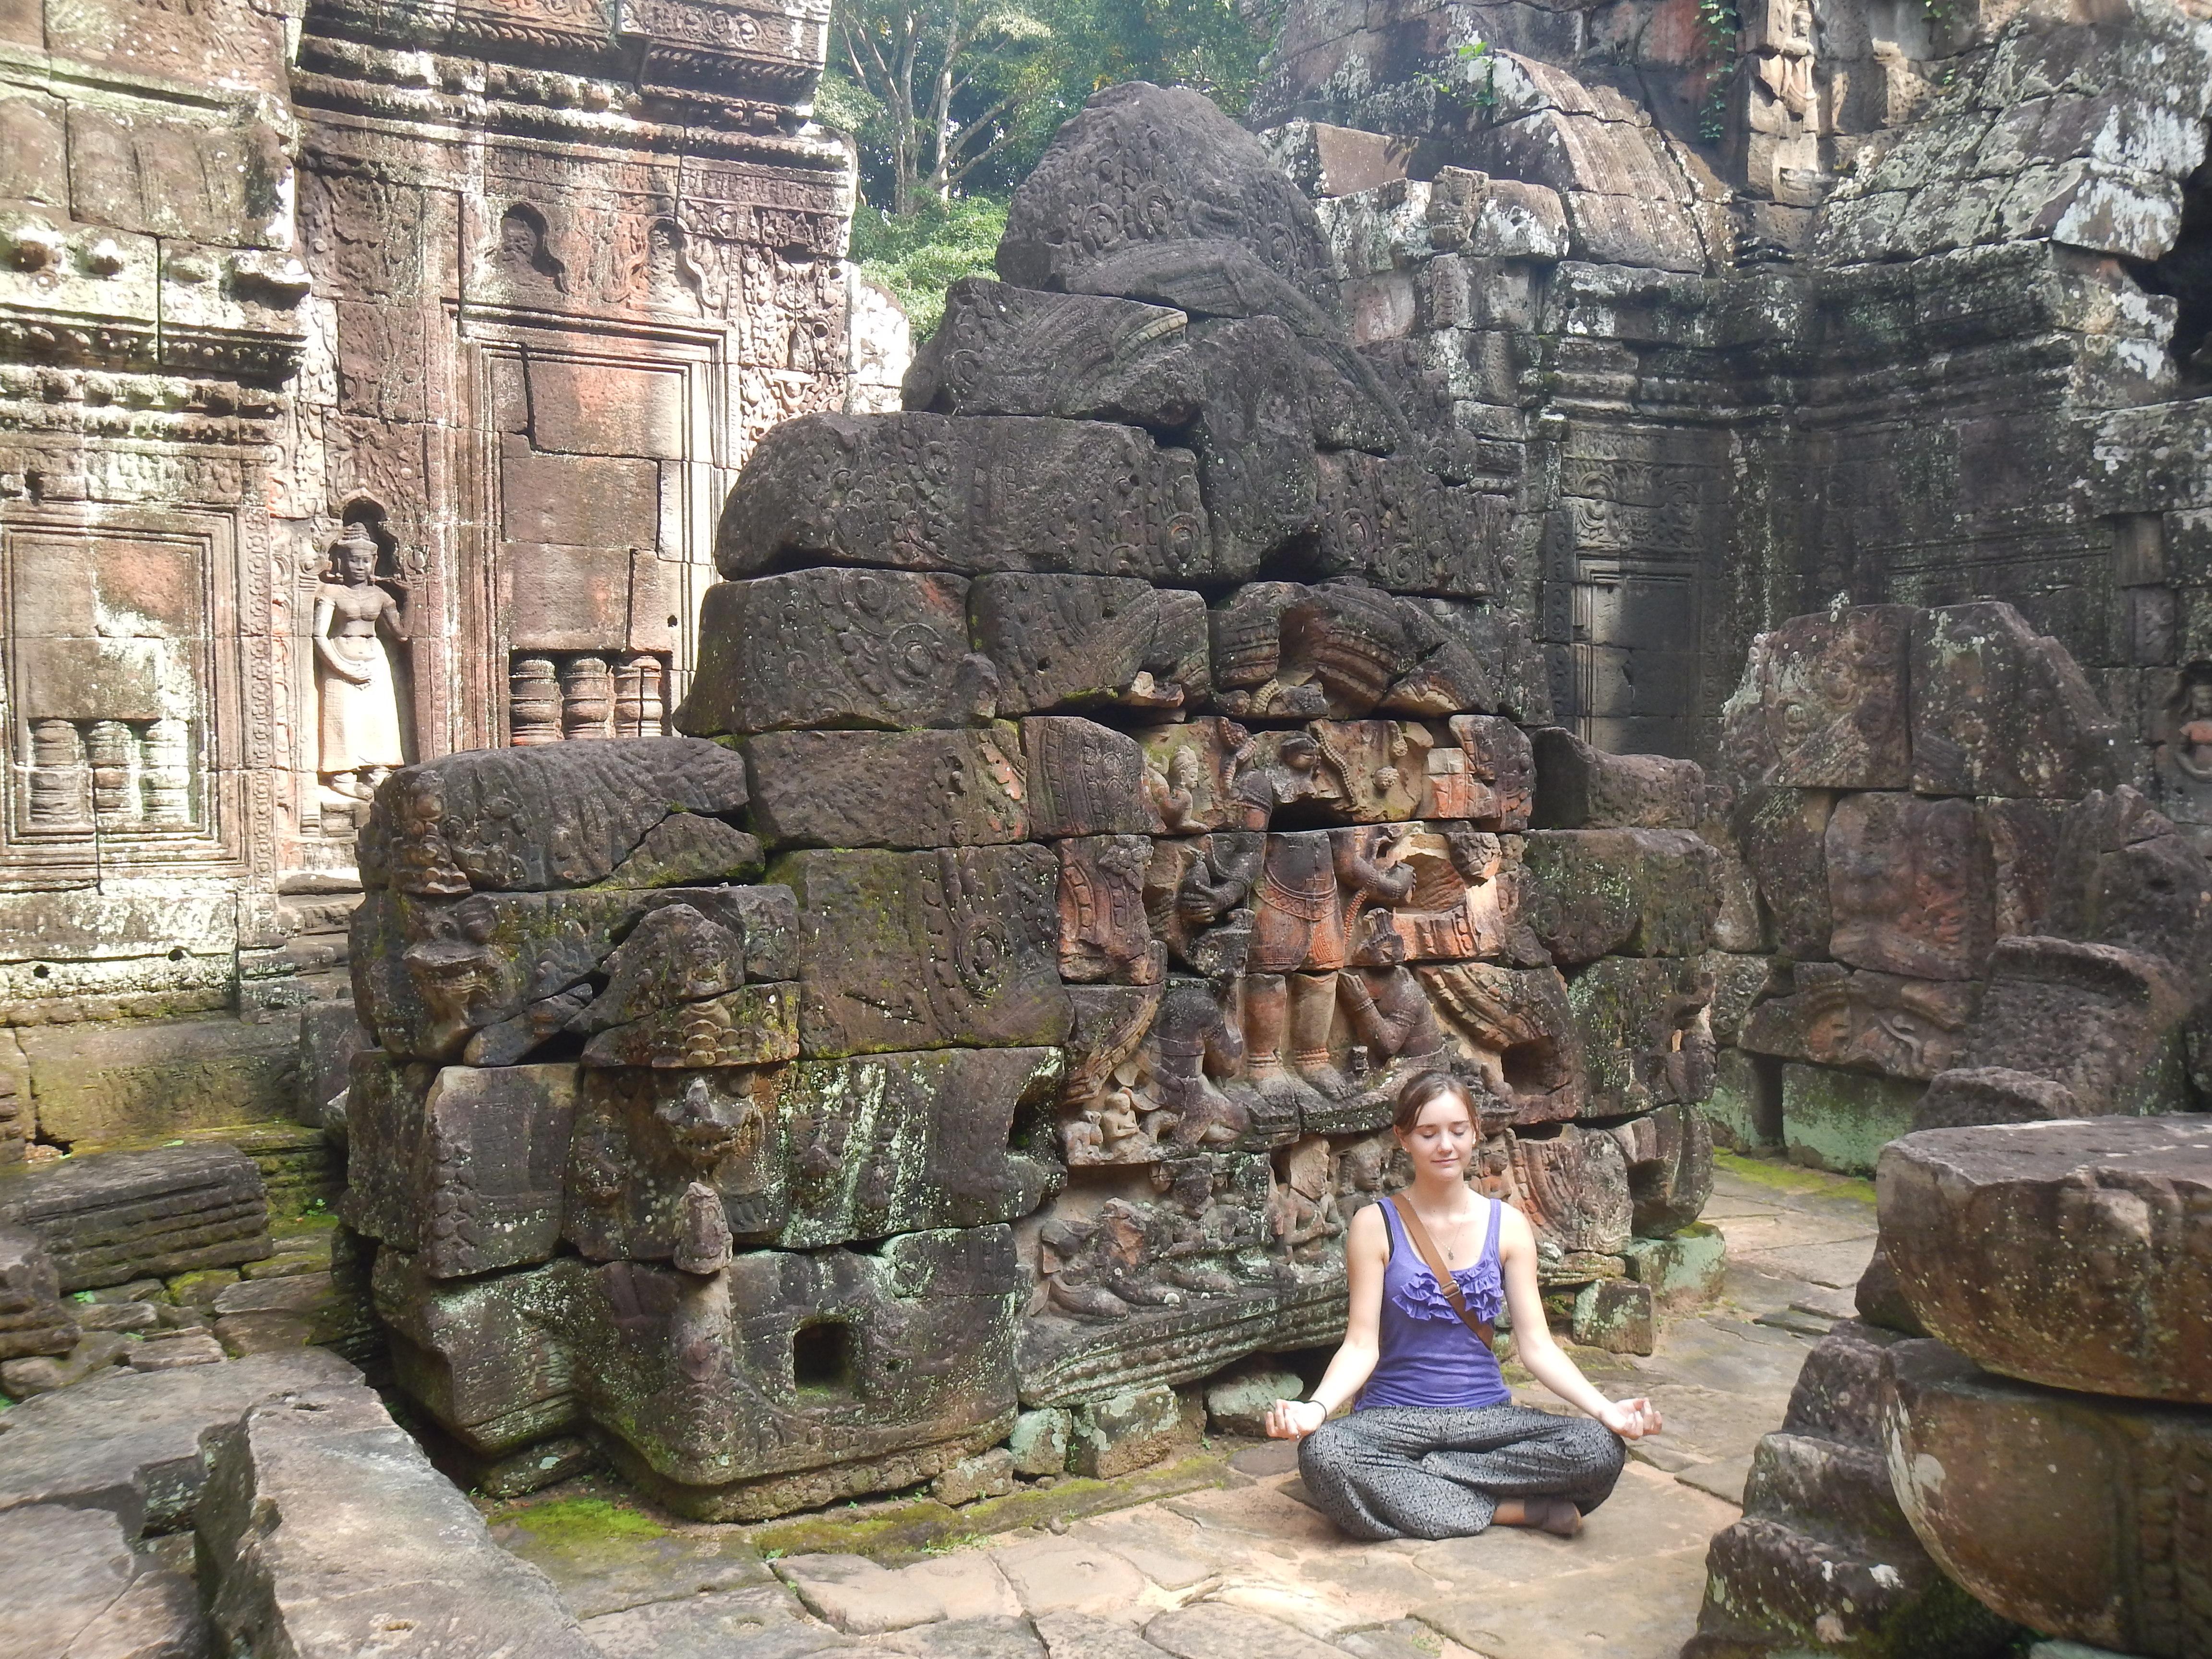 In Banteay Srei, Cambodia